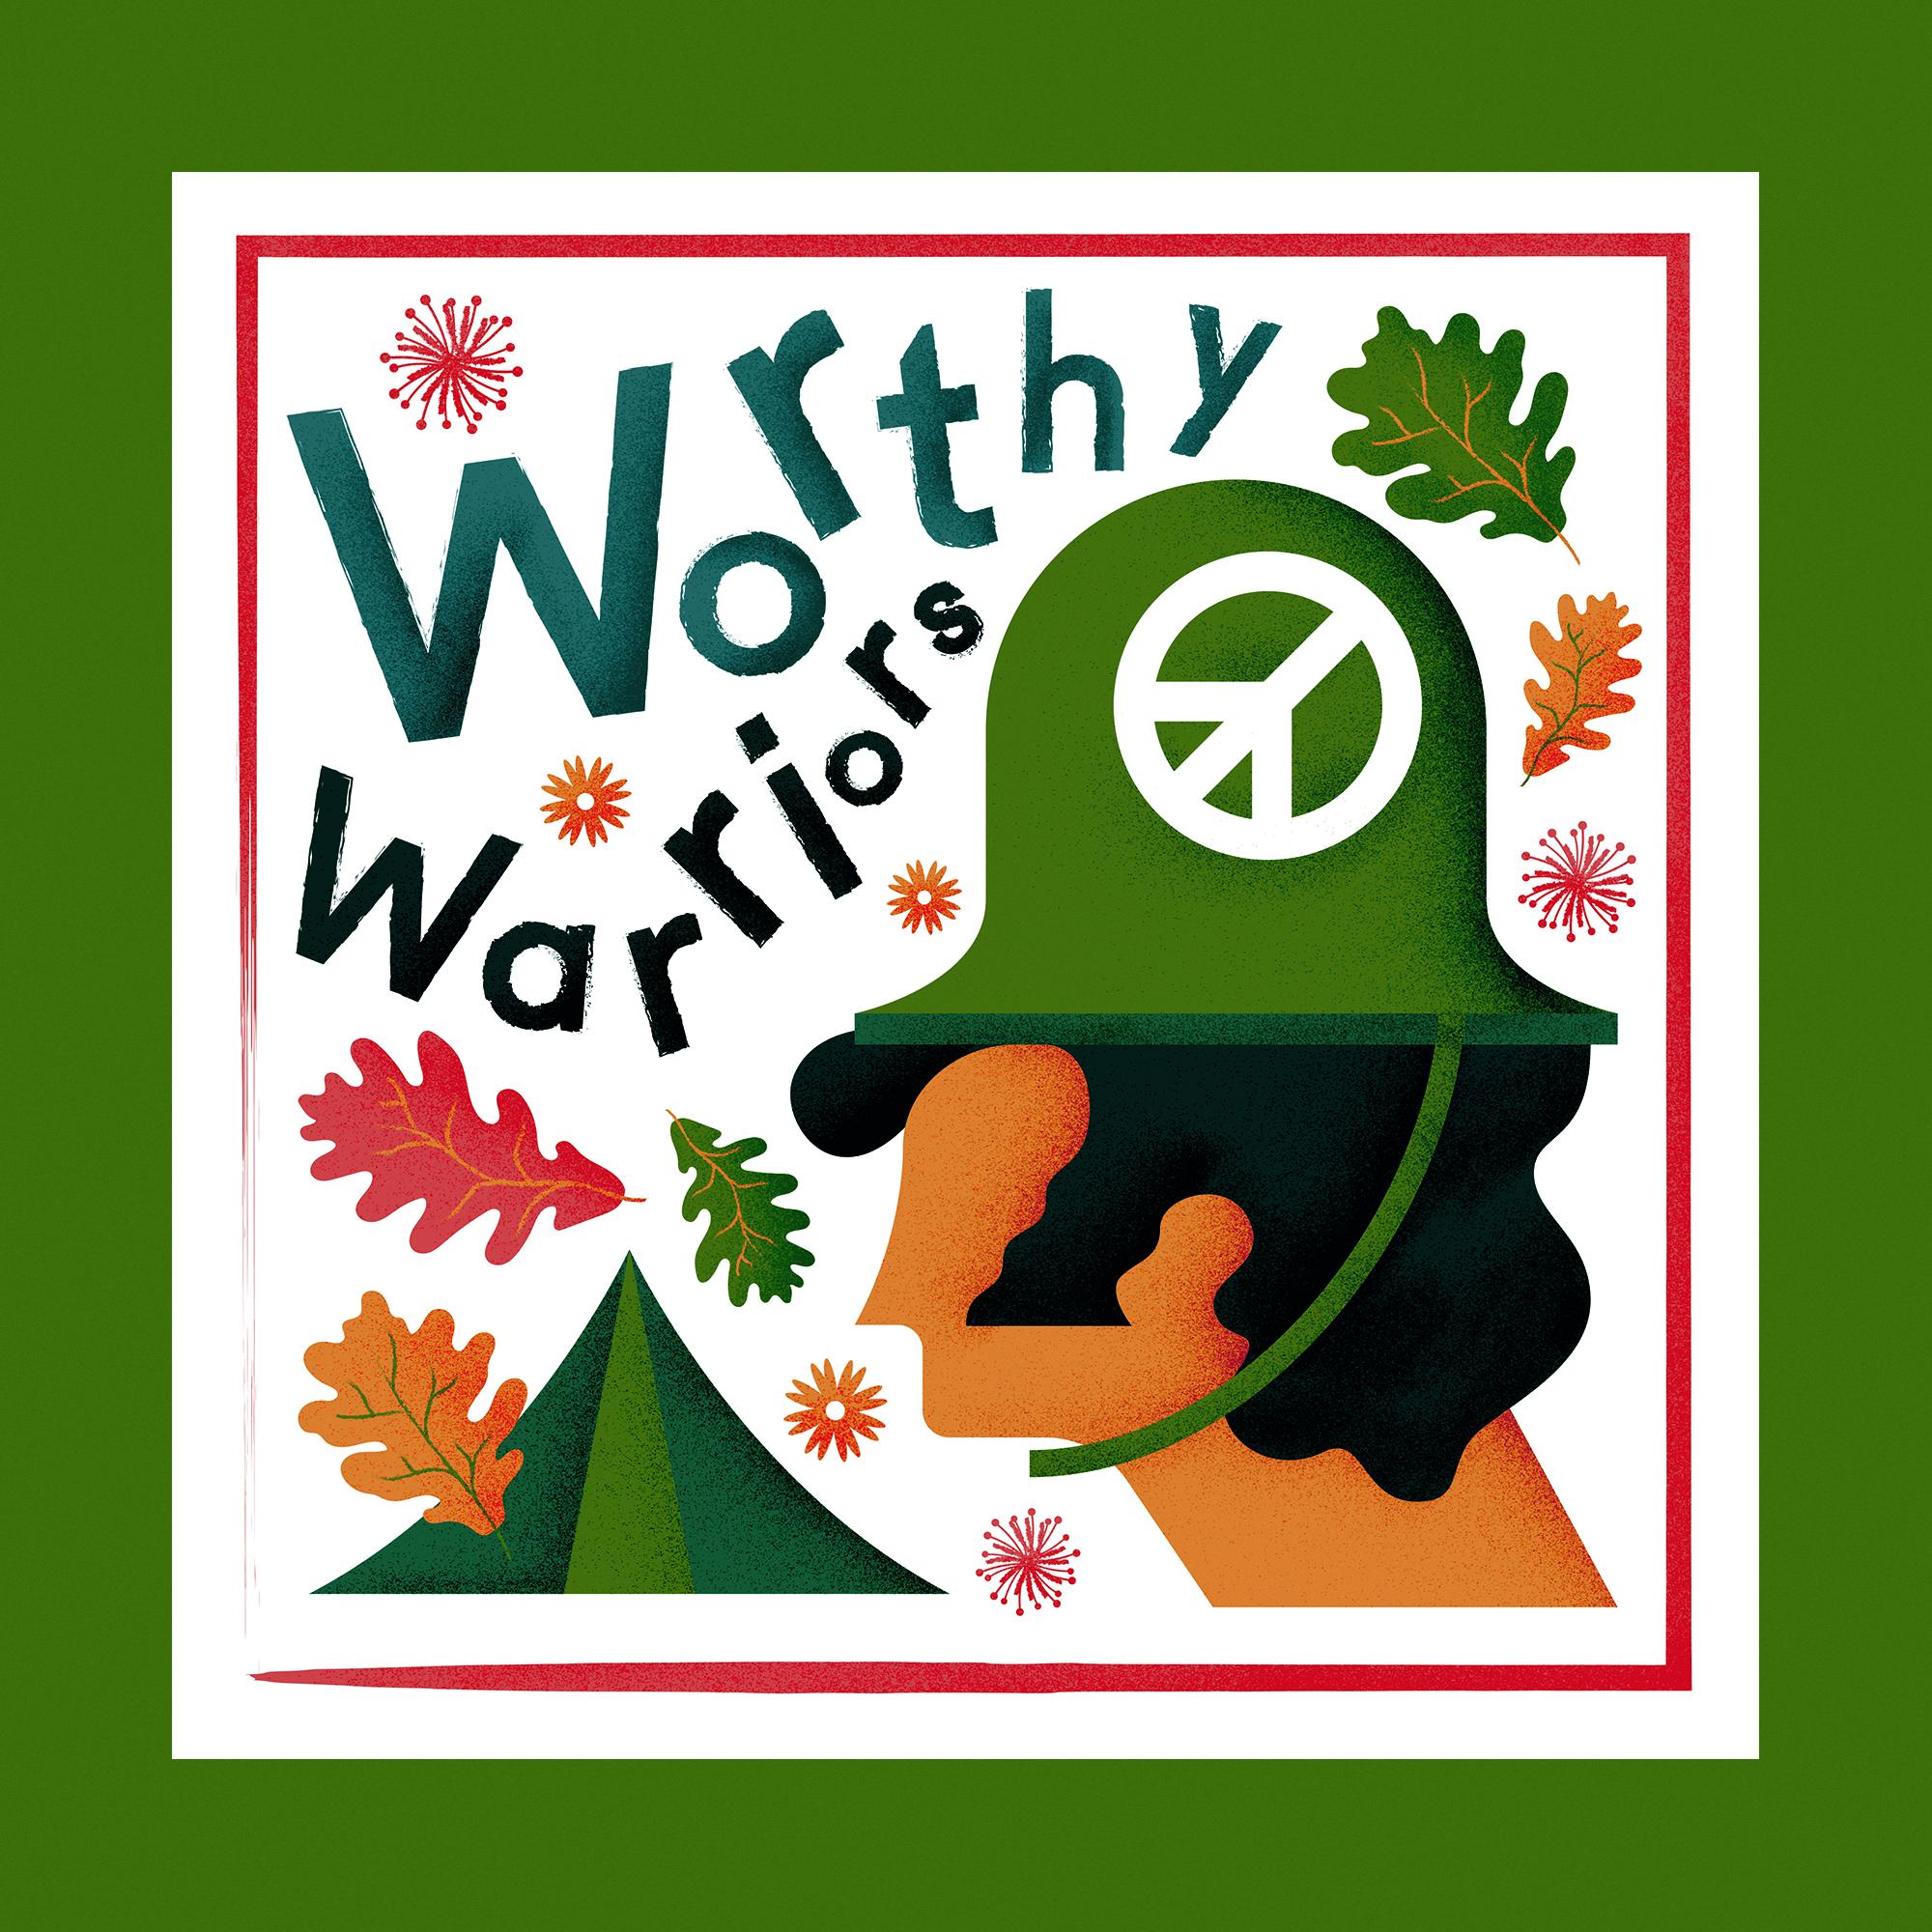 2_Worthy_Warriors_Logo_highres_bkg.jpg